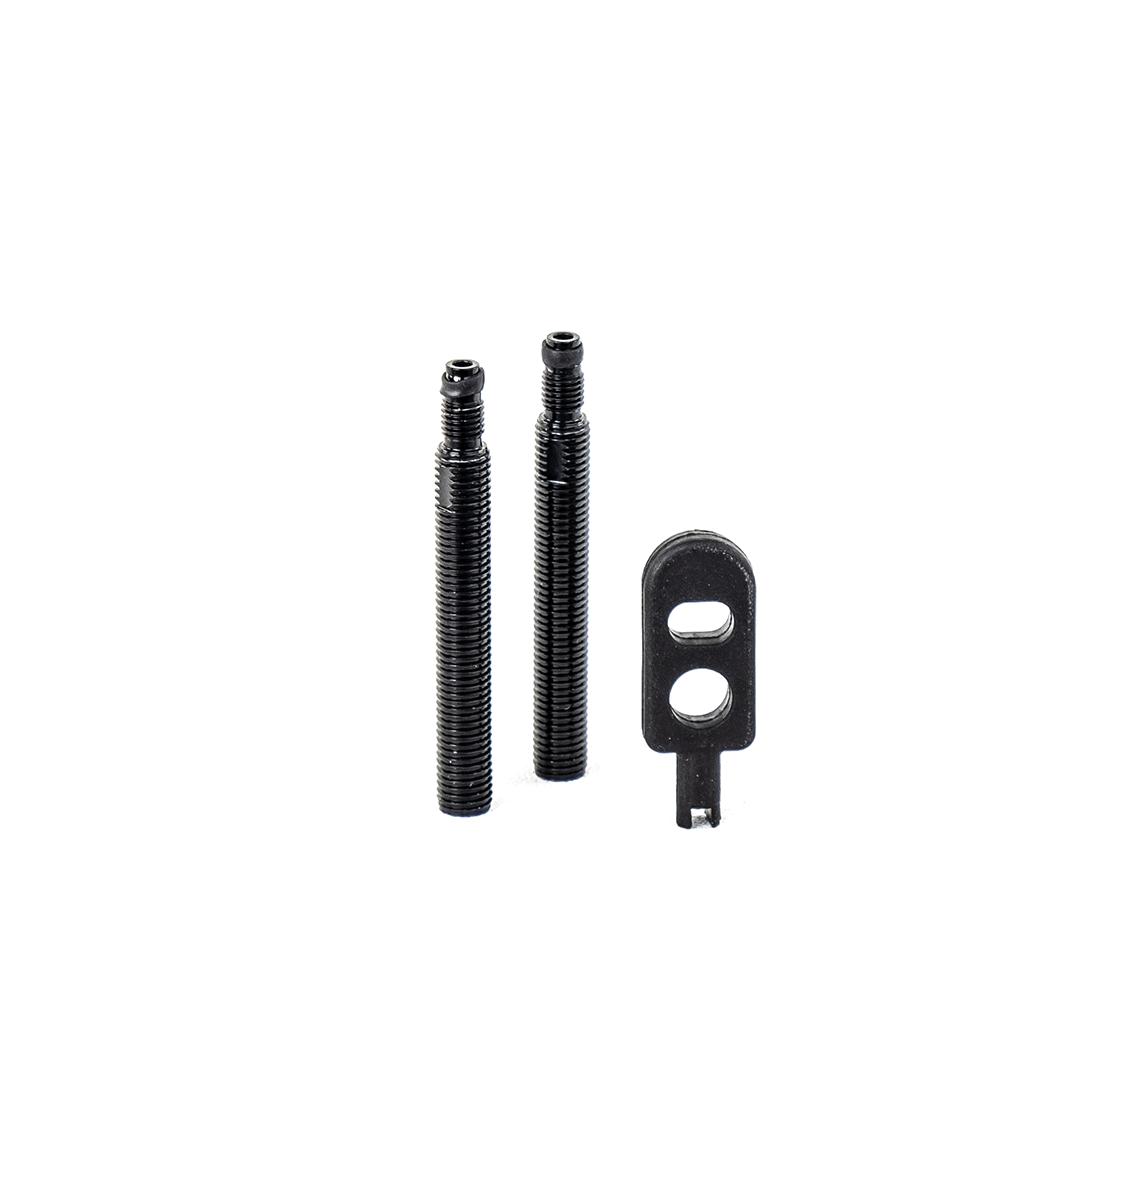 hutchinson-accessories-valve-extenders-2